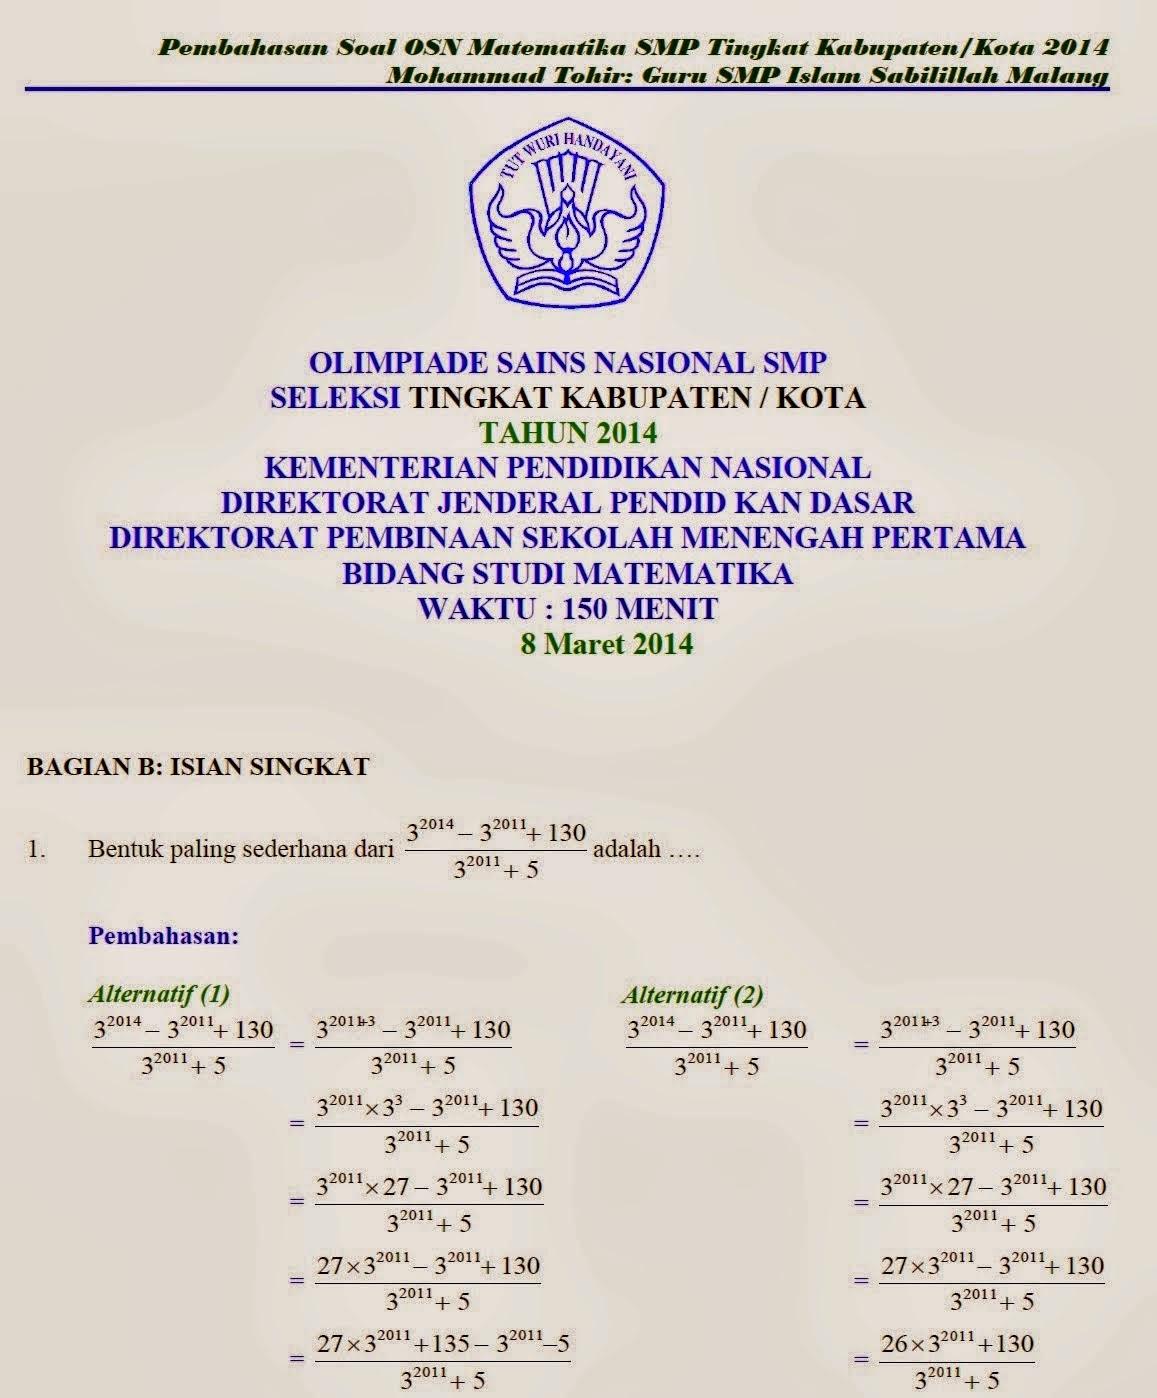 Mathematics Sport Soal Dan Pembahasan Osn Matematika Smp Tingkat Kabupaten Kota 2014 Bagian B